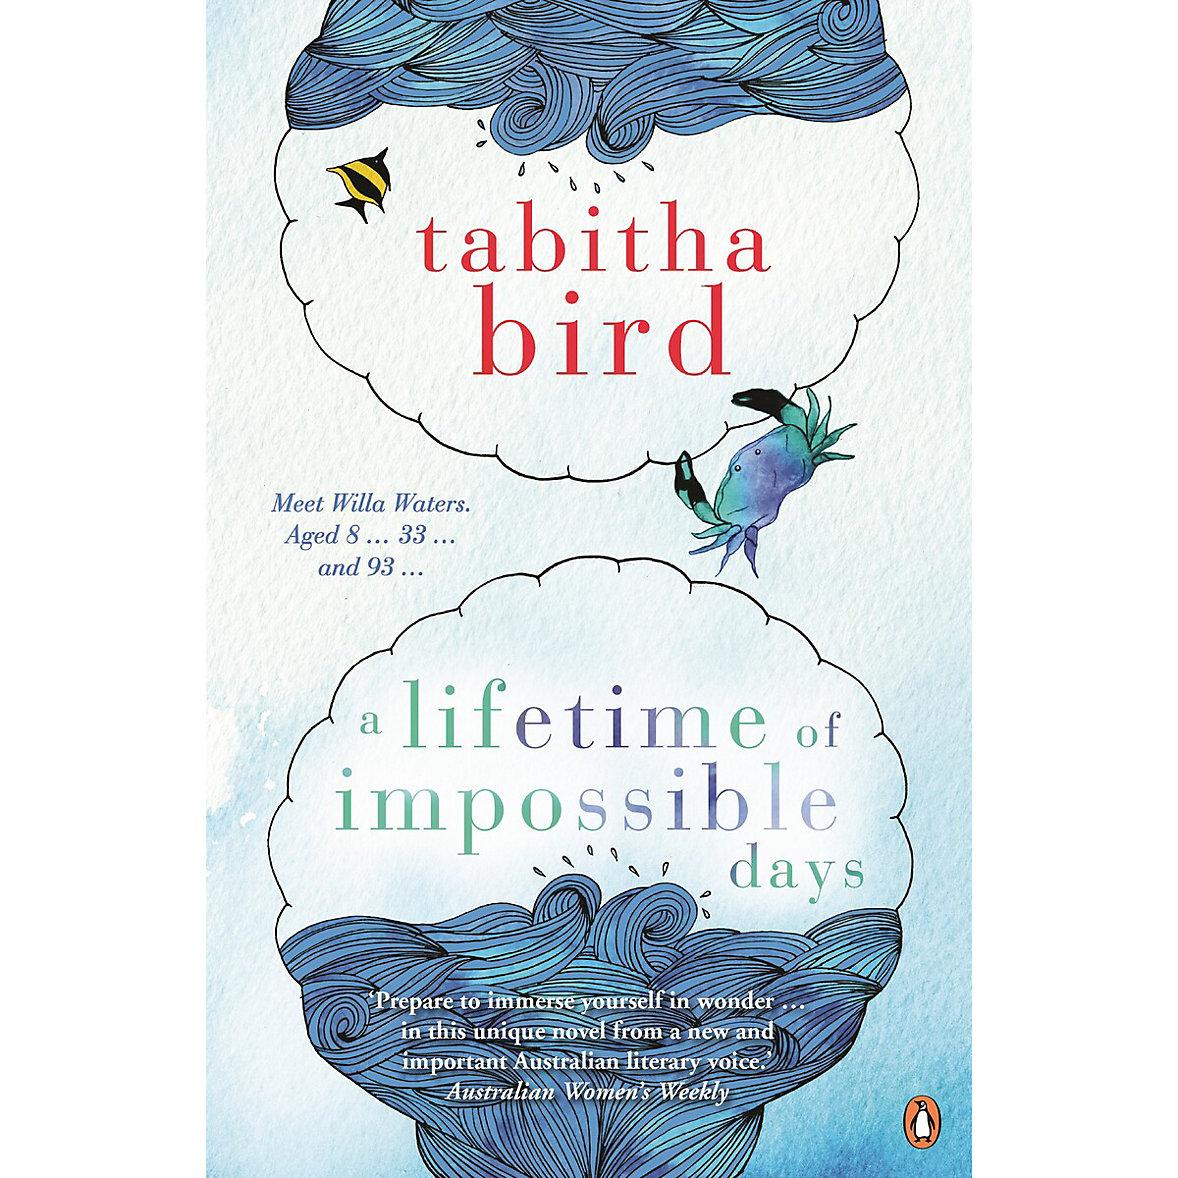 Lifetime of Impossible Days - Tabitha Ann Bird